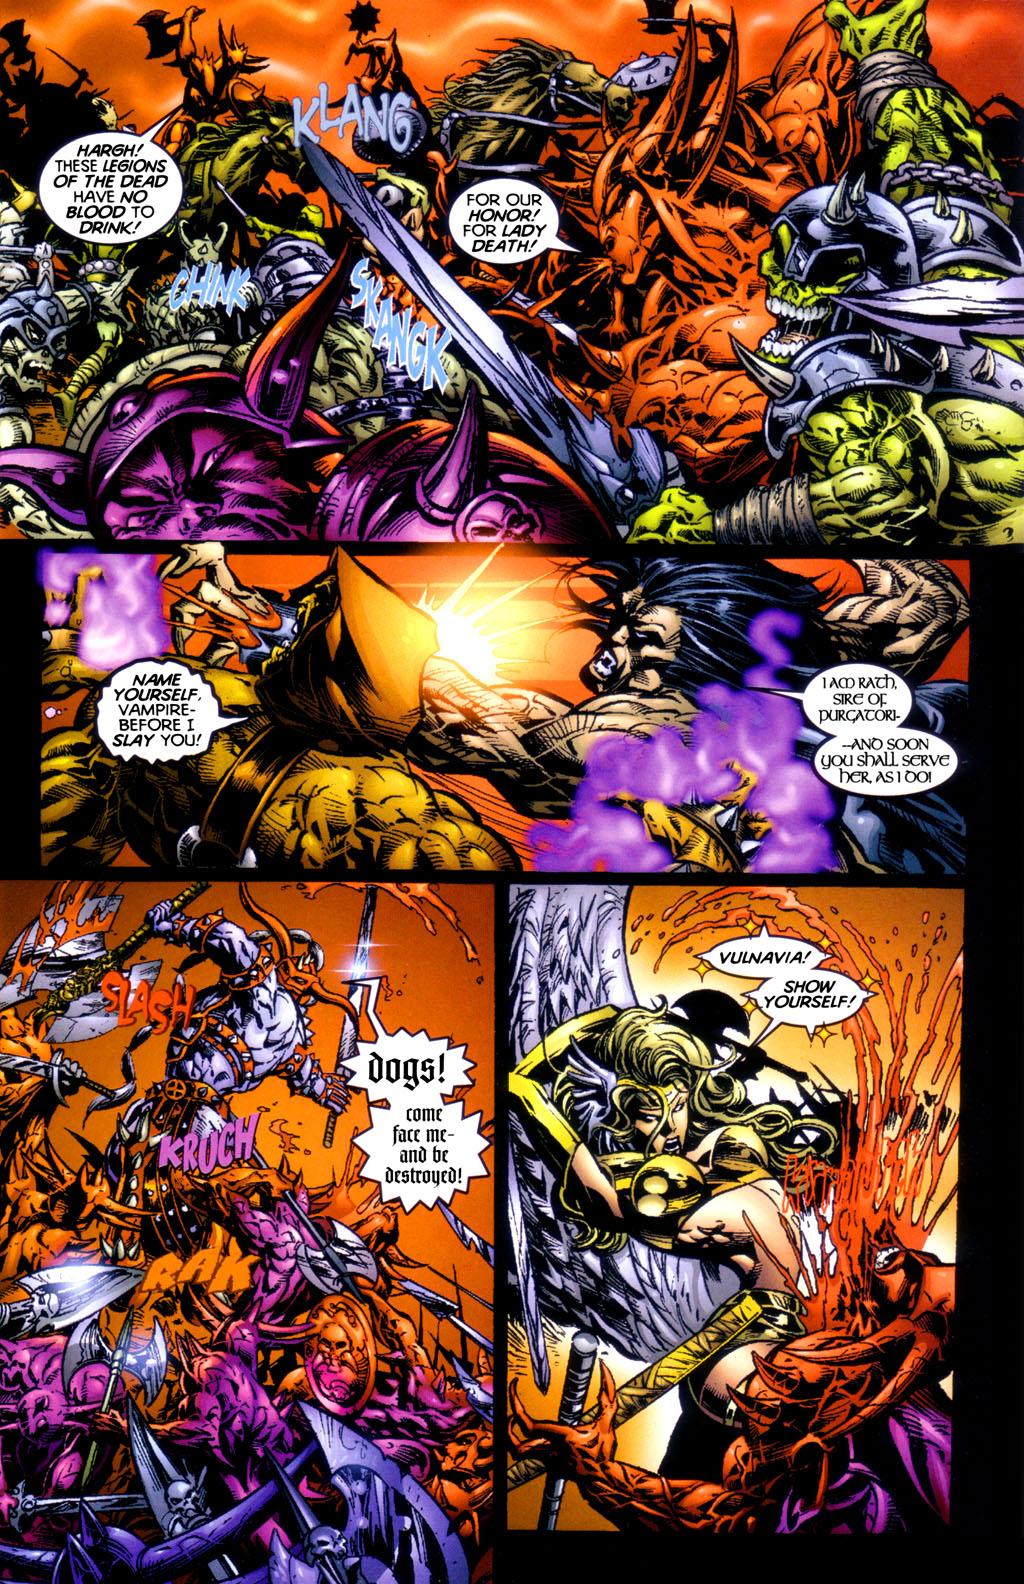 Read online Lady Death vs. Purgatori comic -  Issue # Full - 11